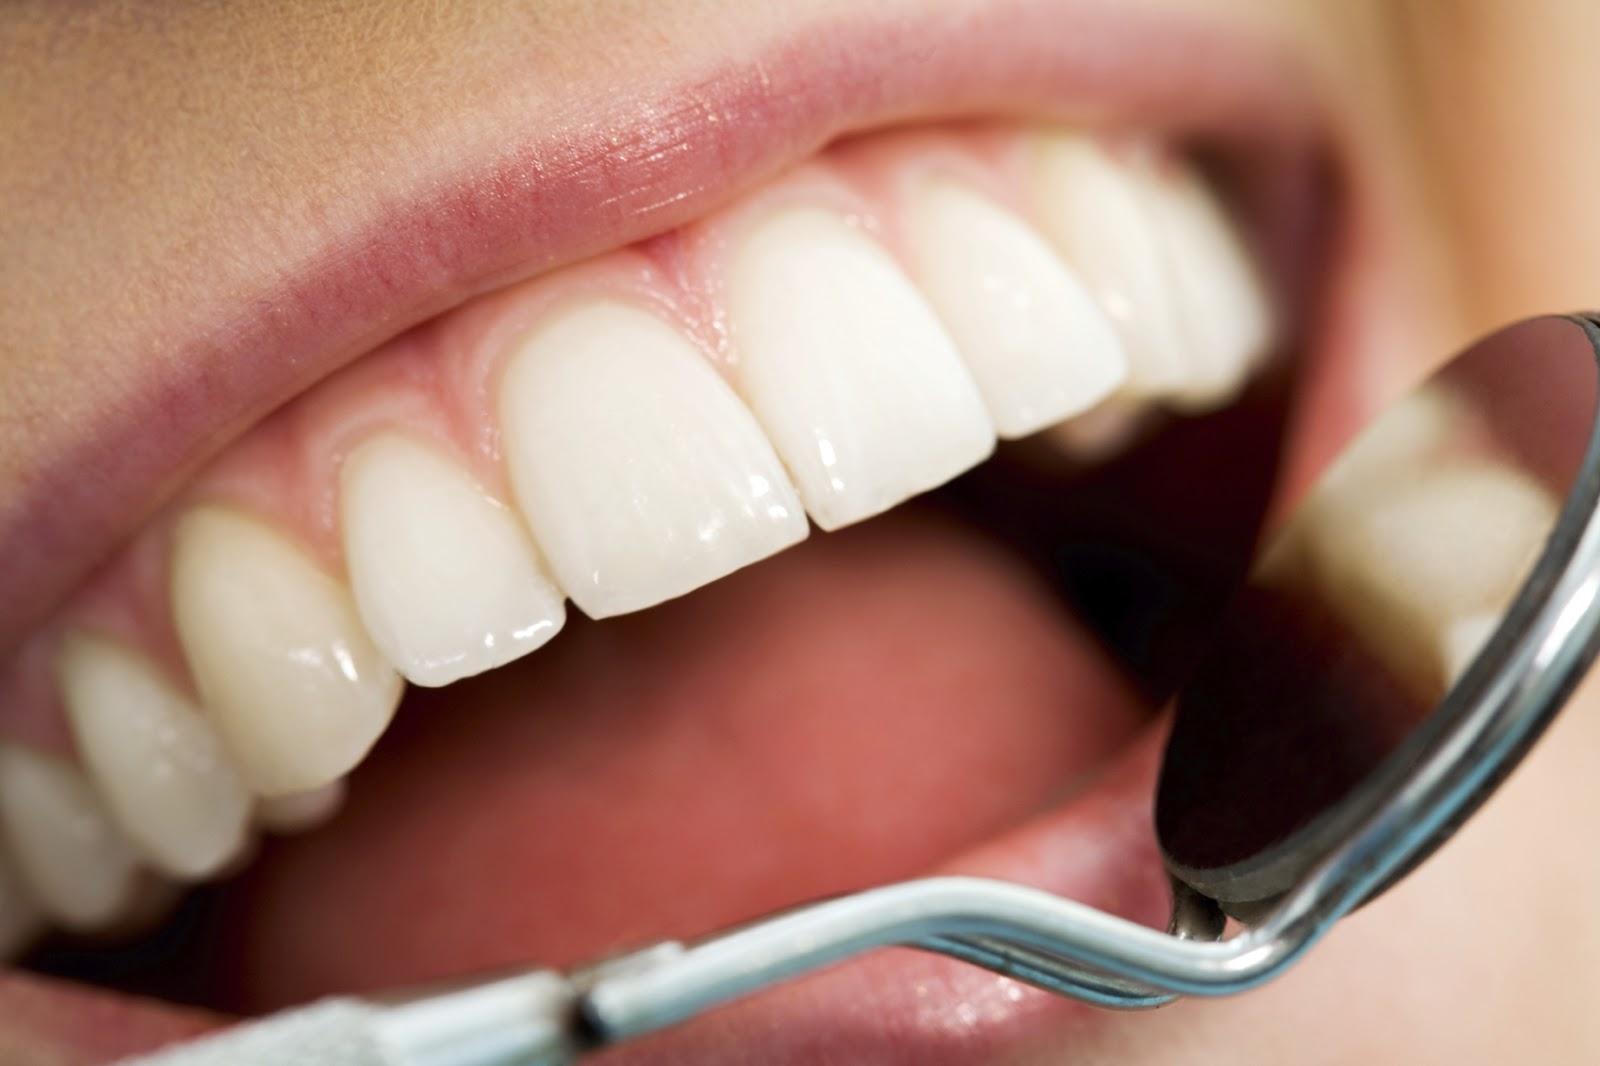 Inilah Penyebab dan Cara Mencegah Gigi Berlubang